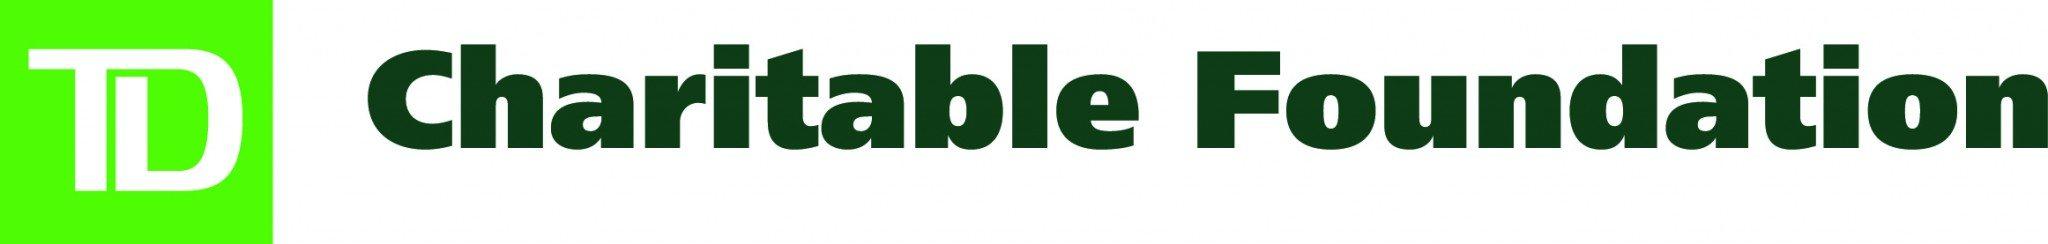 TD Charitable Foundation